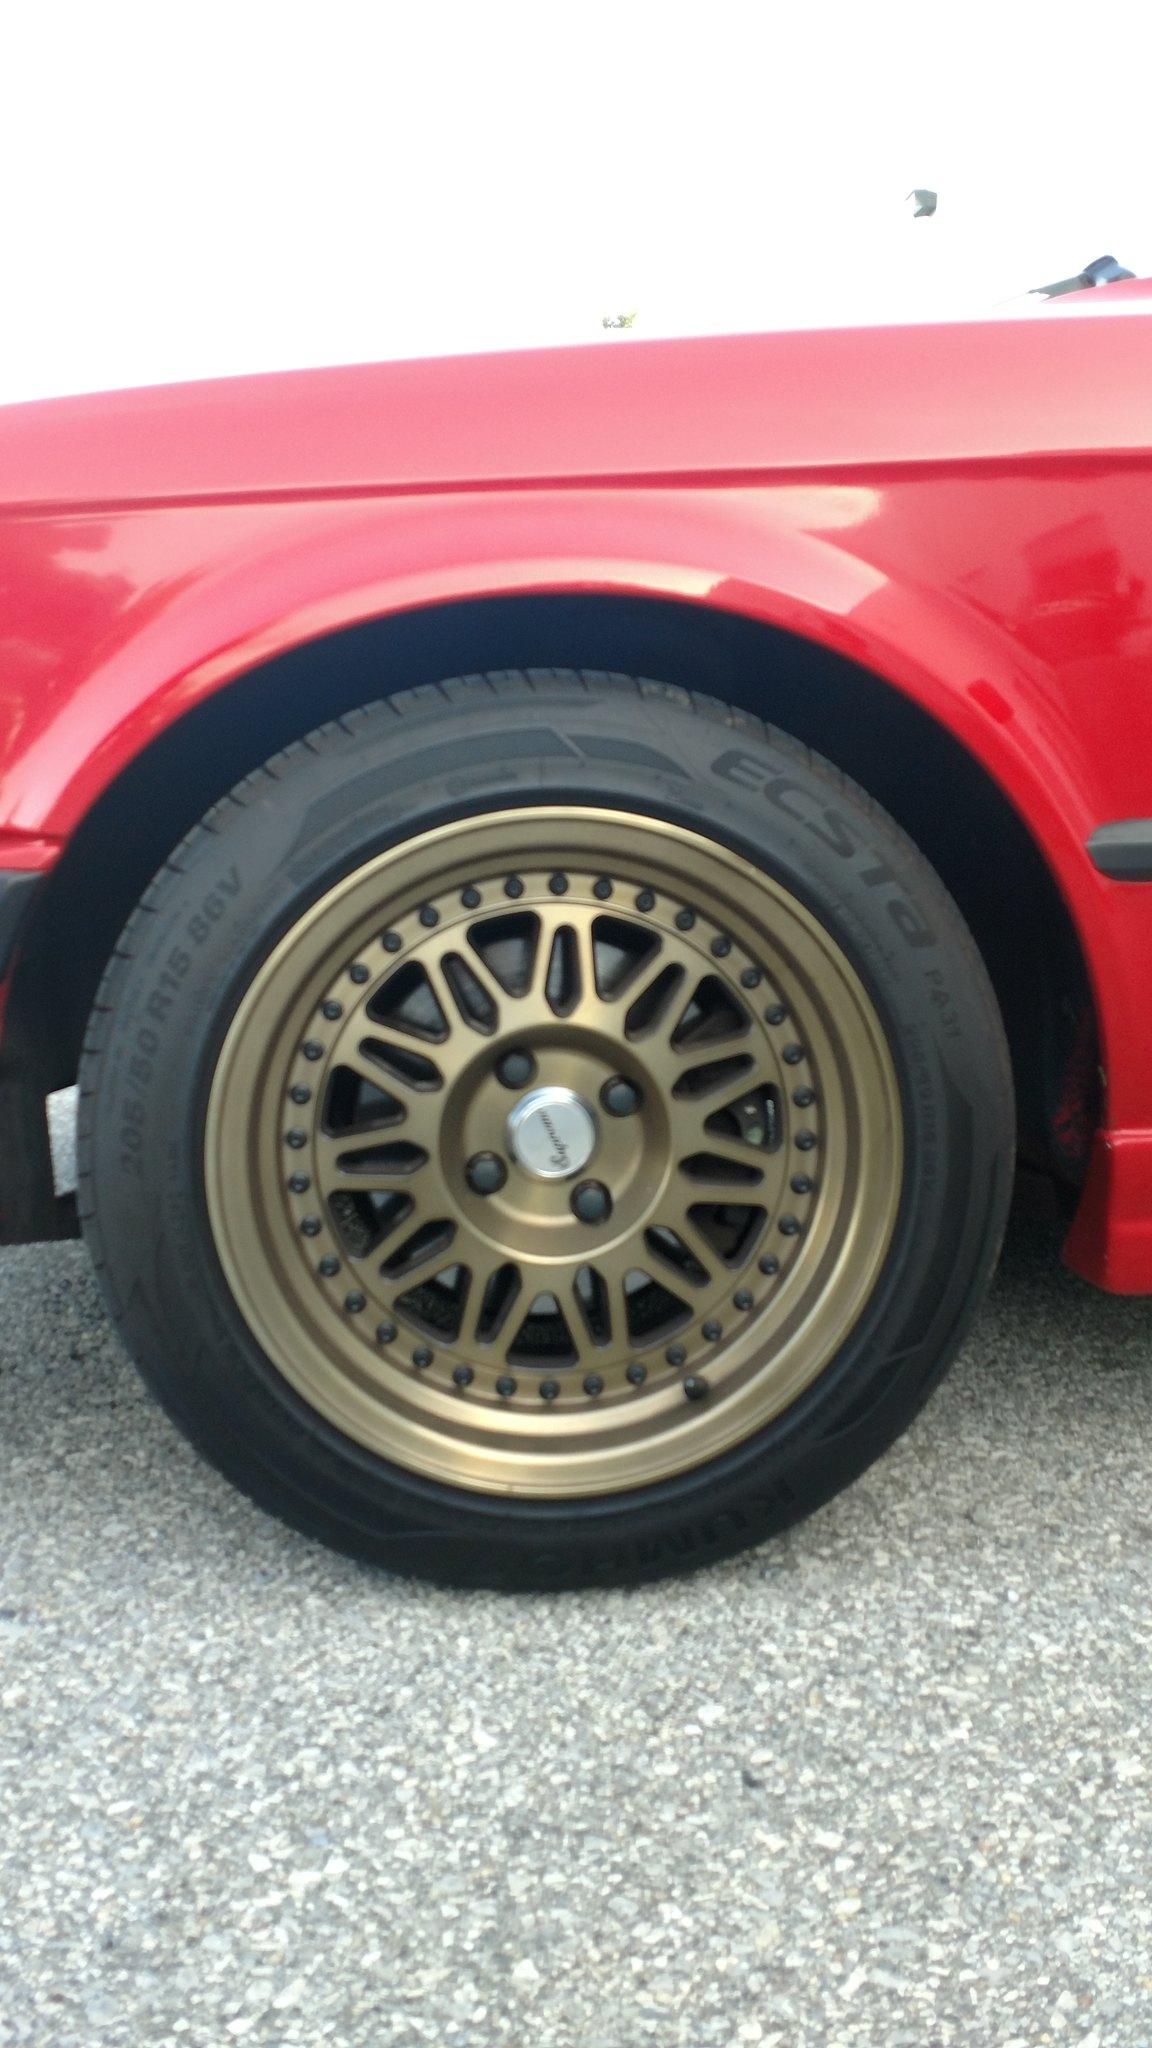 15x8 et25 varrstoen ds12 4x100 wheels with kumho ecsta tires